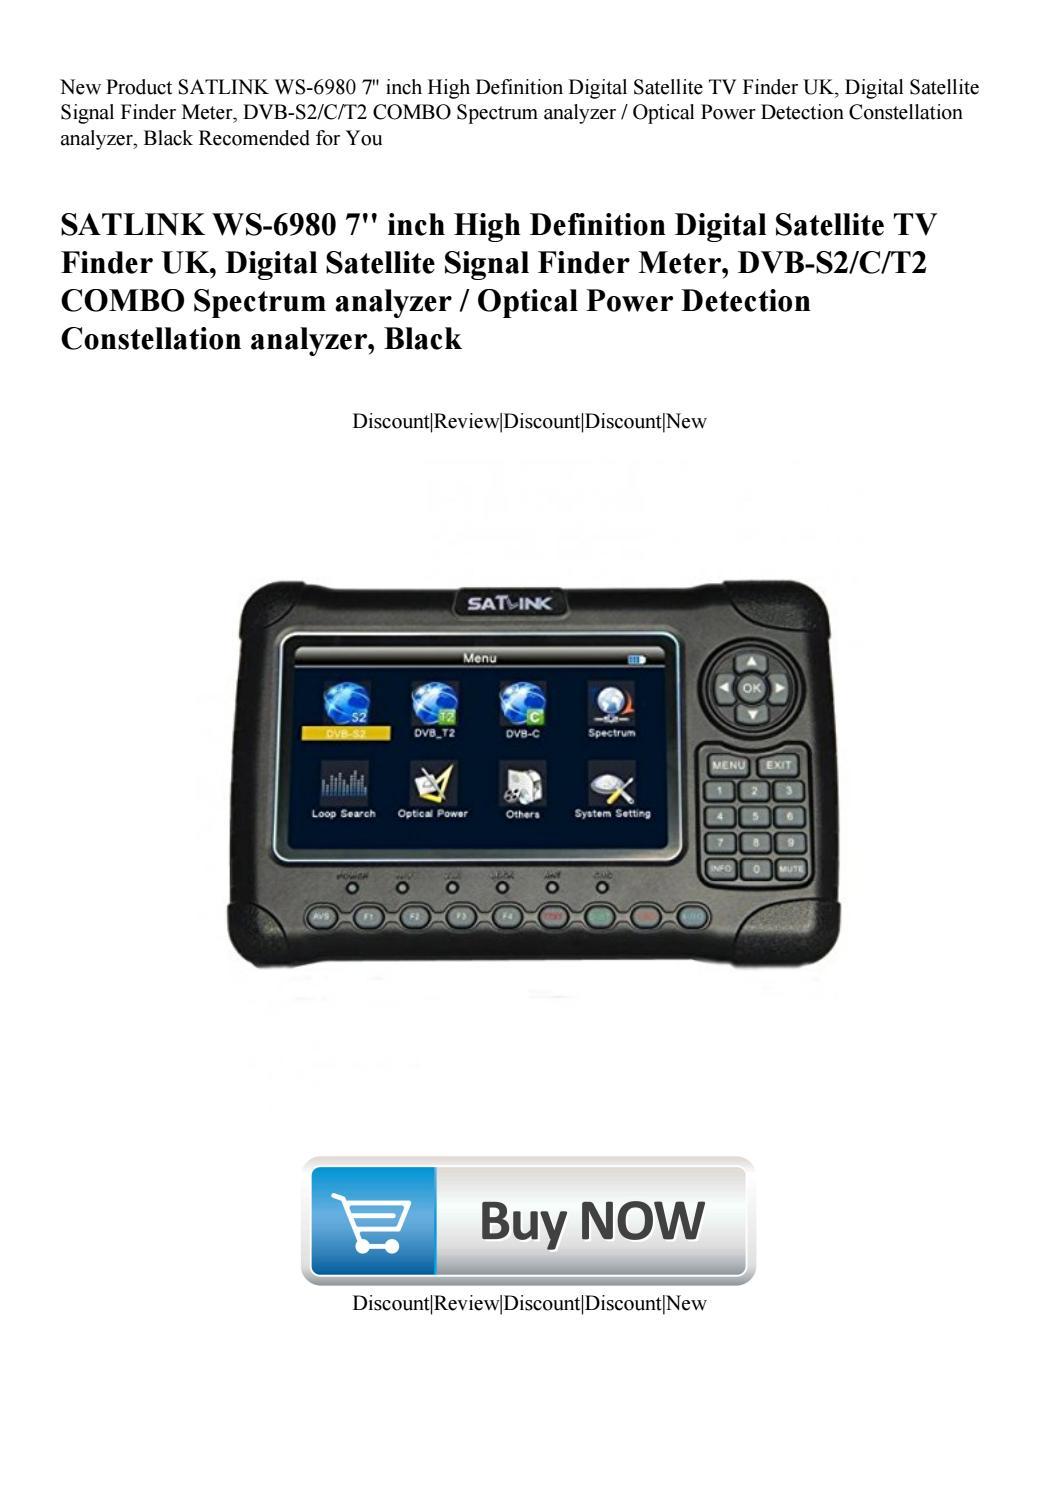 SATLINK WS-6980 DVB-S2//C//T2 COMBO Spectrum analyzer Digital Satellite TV Finder